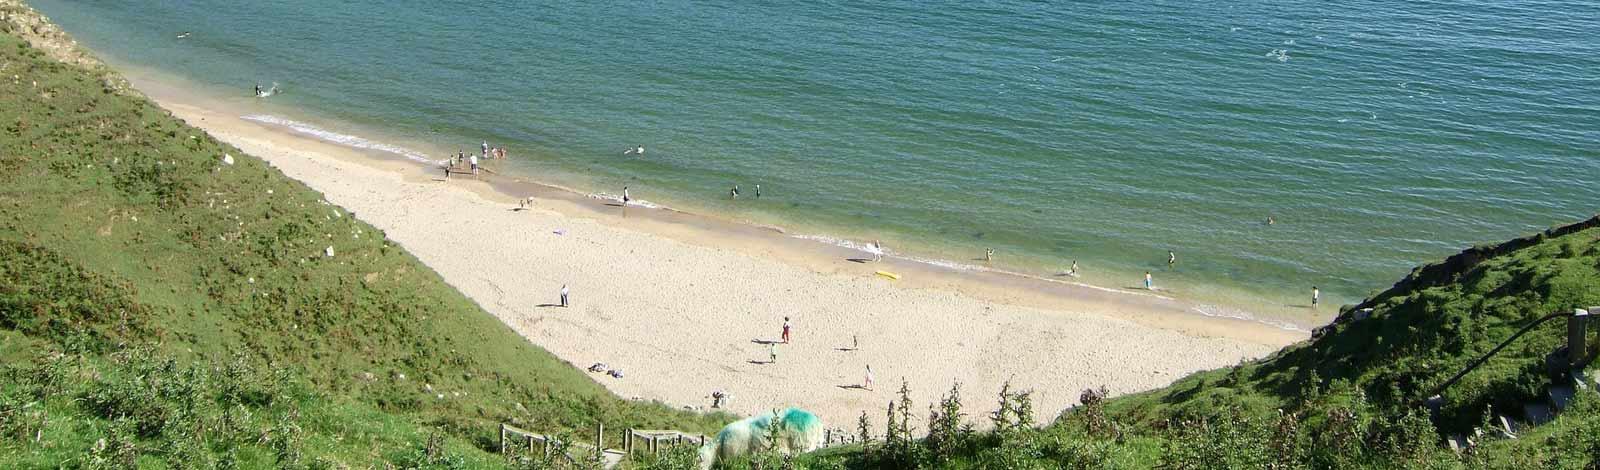 Silver Strand Galway Wild Atlantic Way